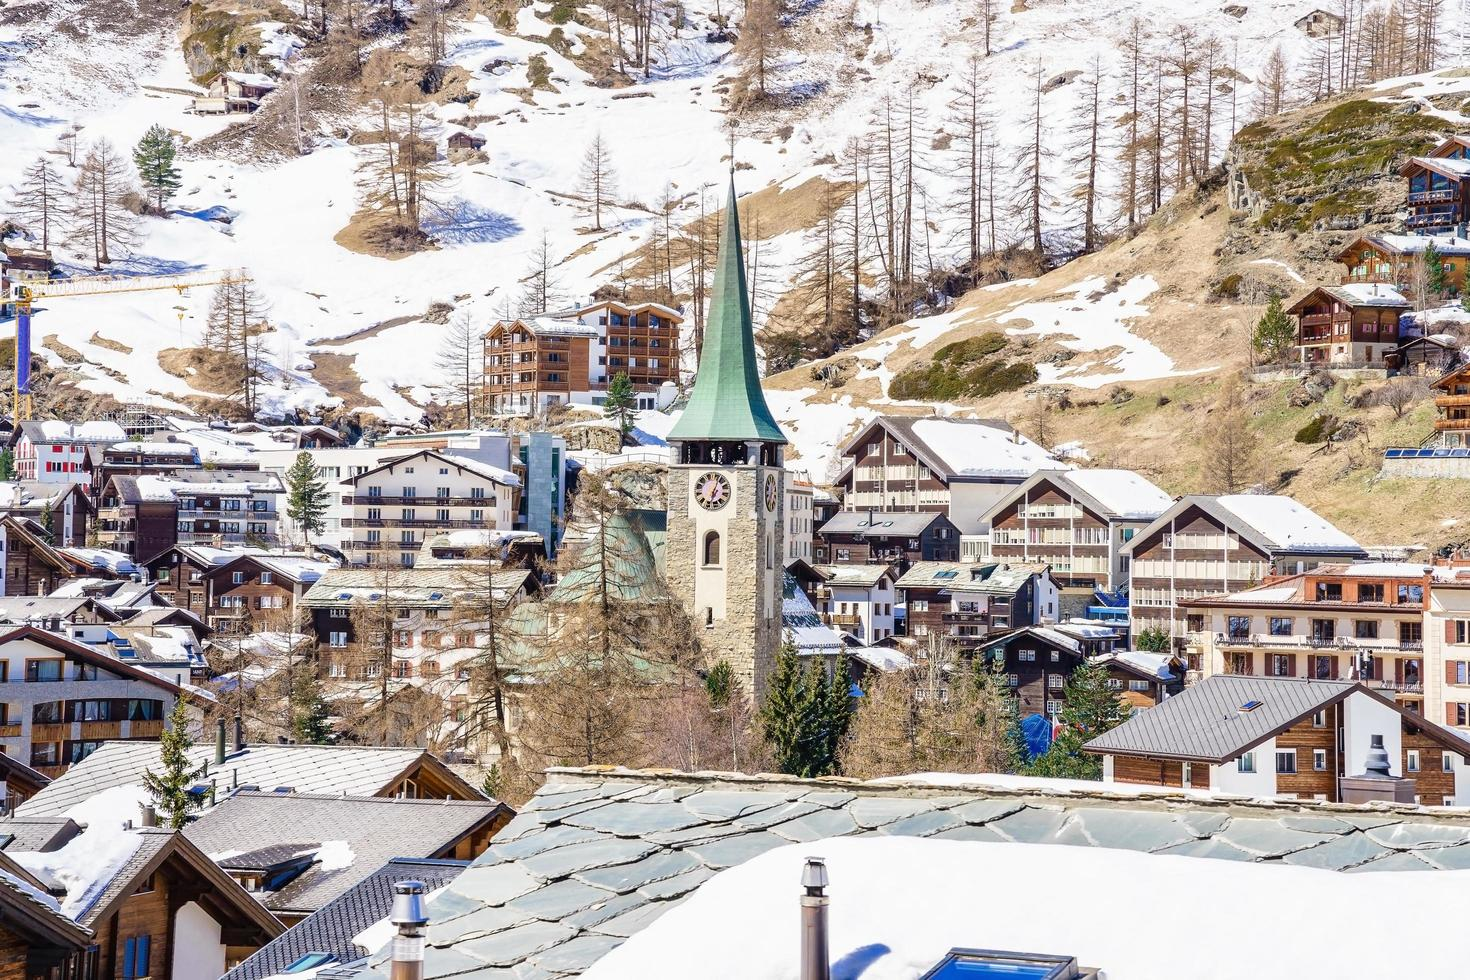 hermosa vista de zermatt, suiza foto